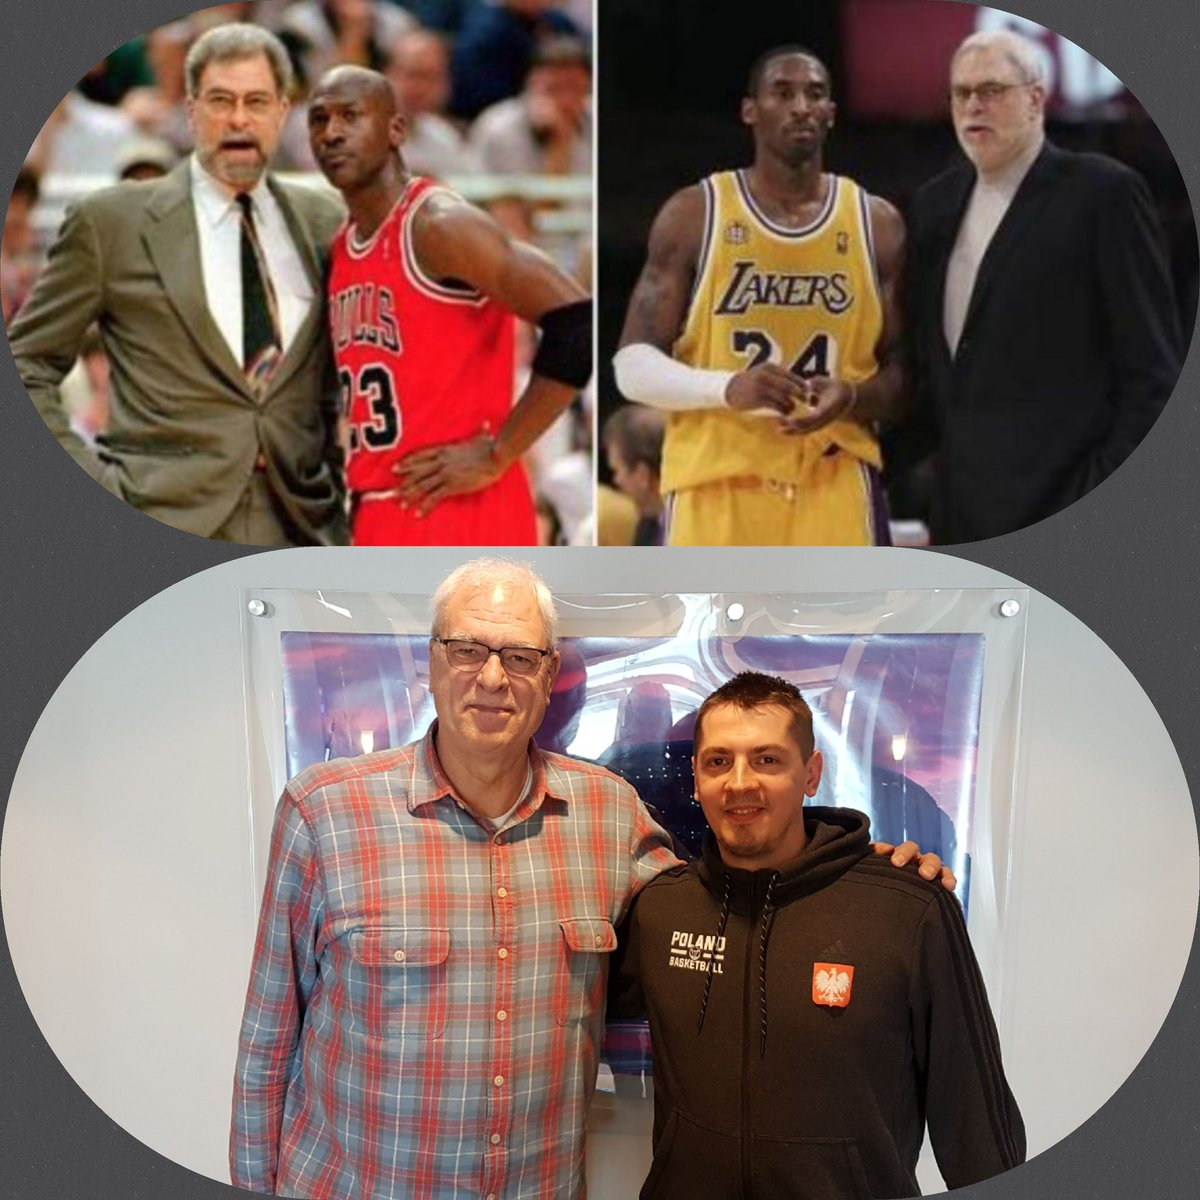 what is the difference ???😅😉  HAPPY BIRTHDAY @PhilJackson11, #NBABDAY #nba #Bulls #Lakers #Knicks @chicagobulls @Lakers @nyknicks #RunWithUs #LakeShow #NewYorkForever @BullsArchive #NBApl